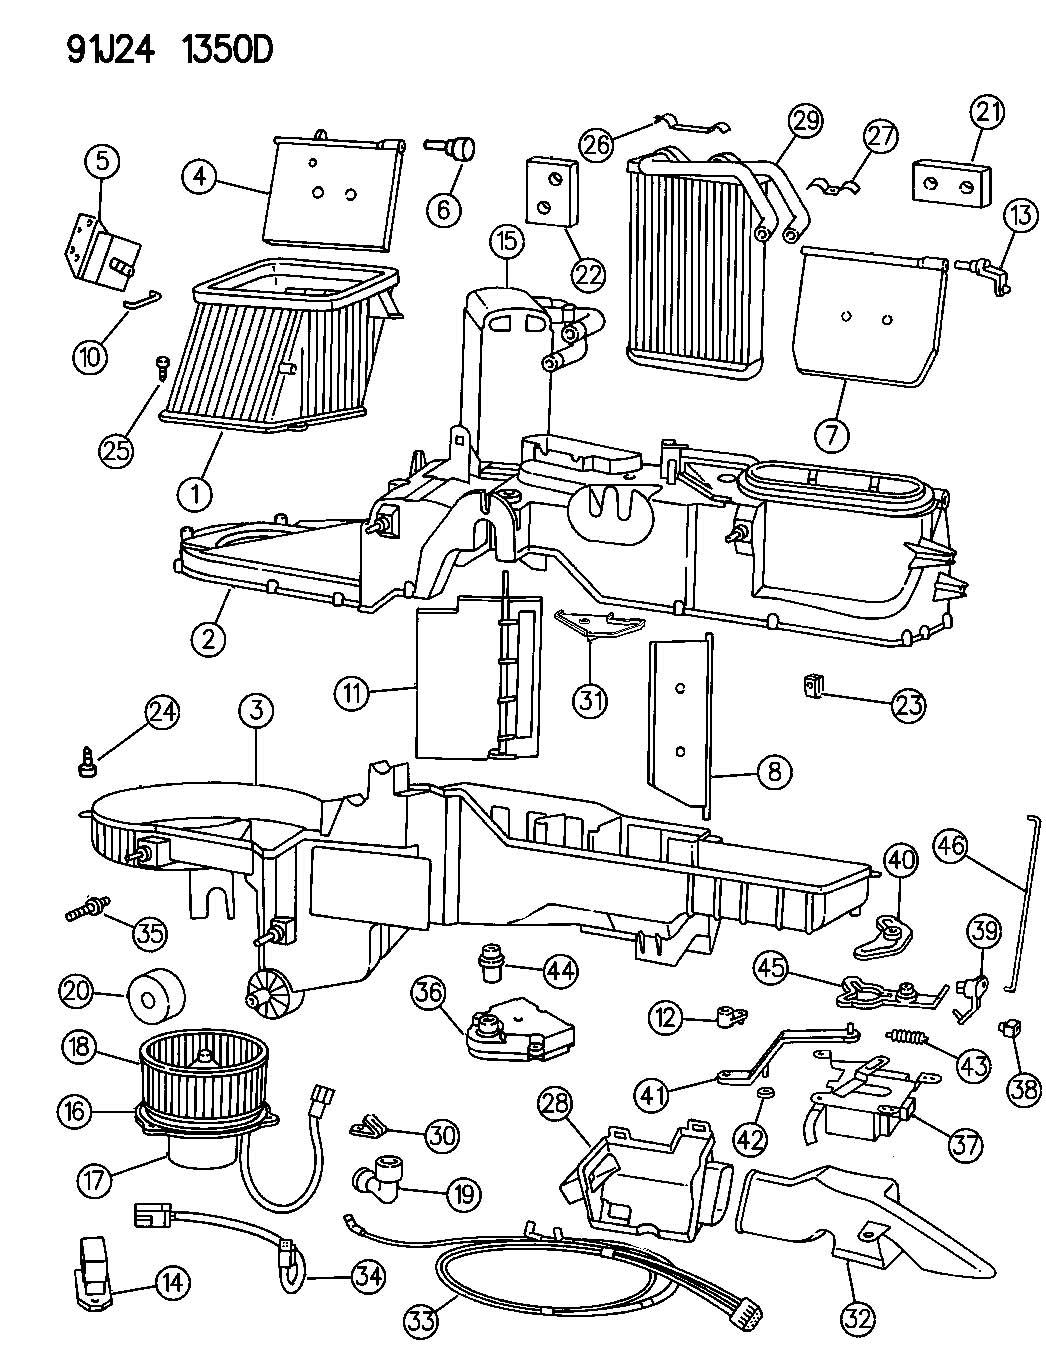 Air Conditioning Unit Air Conditioning Unit For Jeep